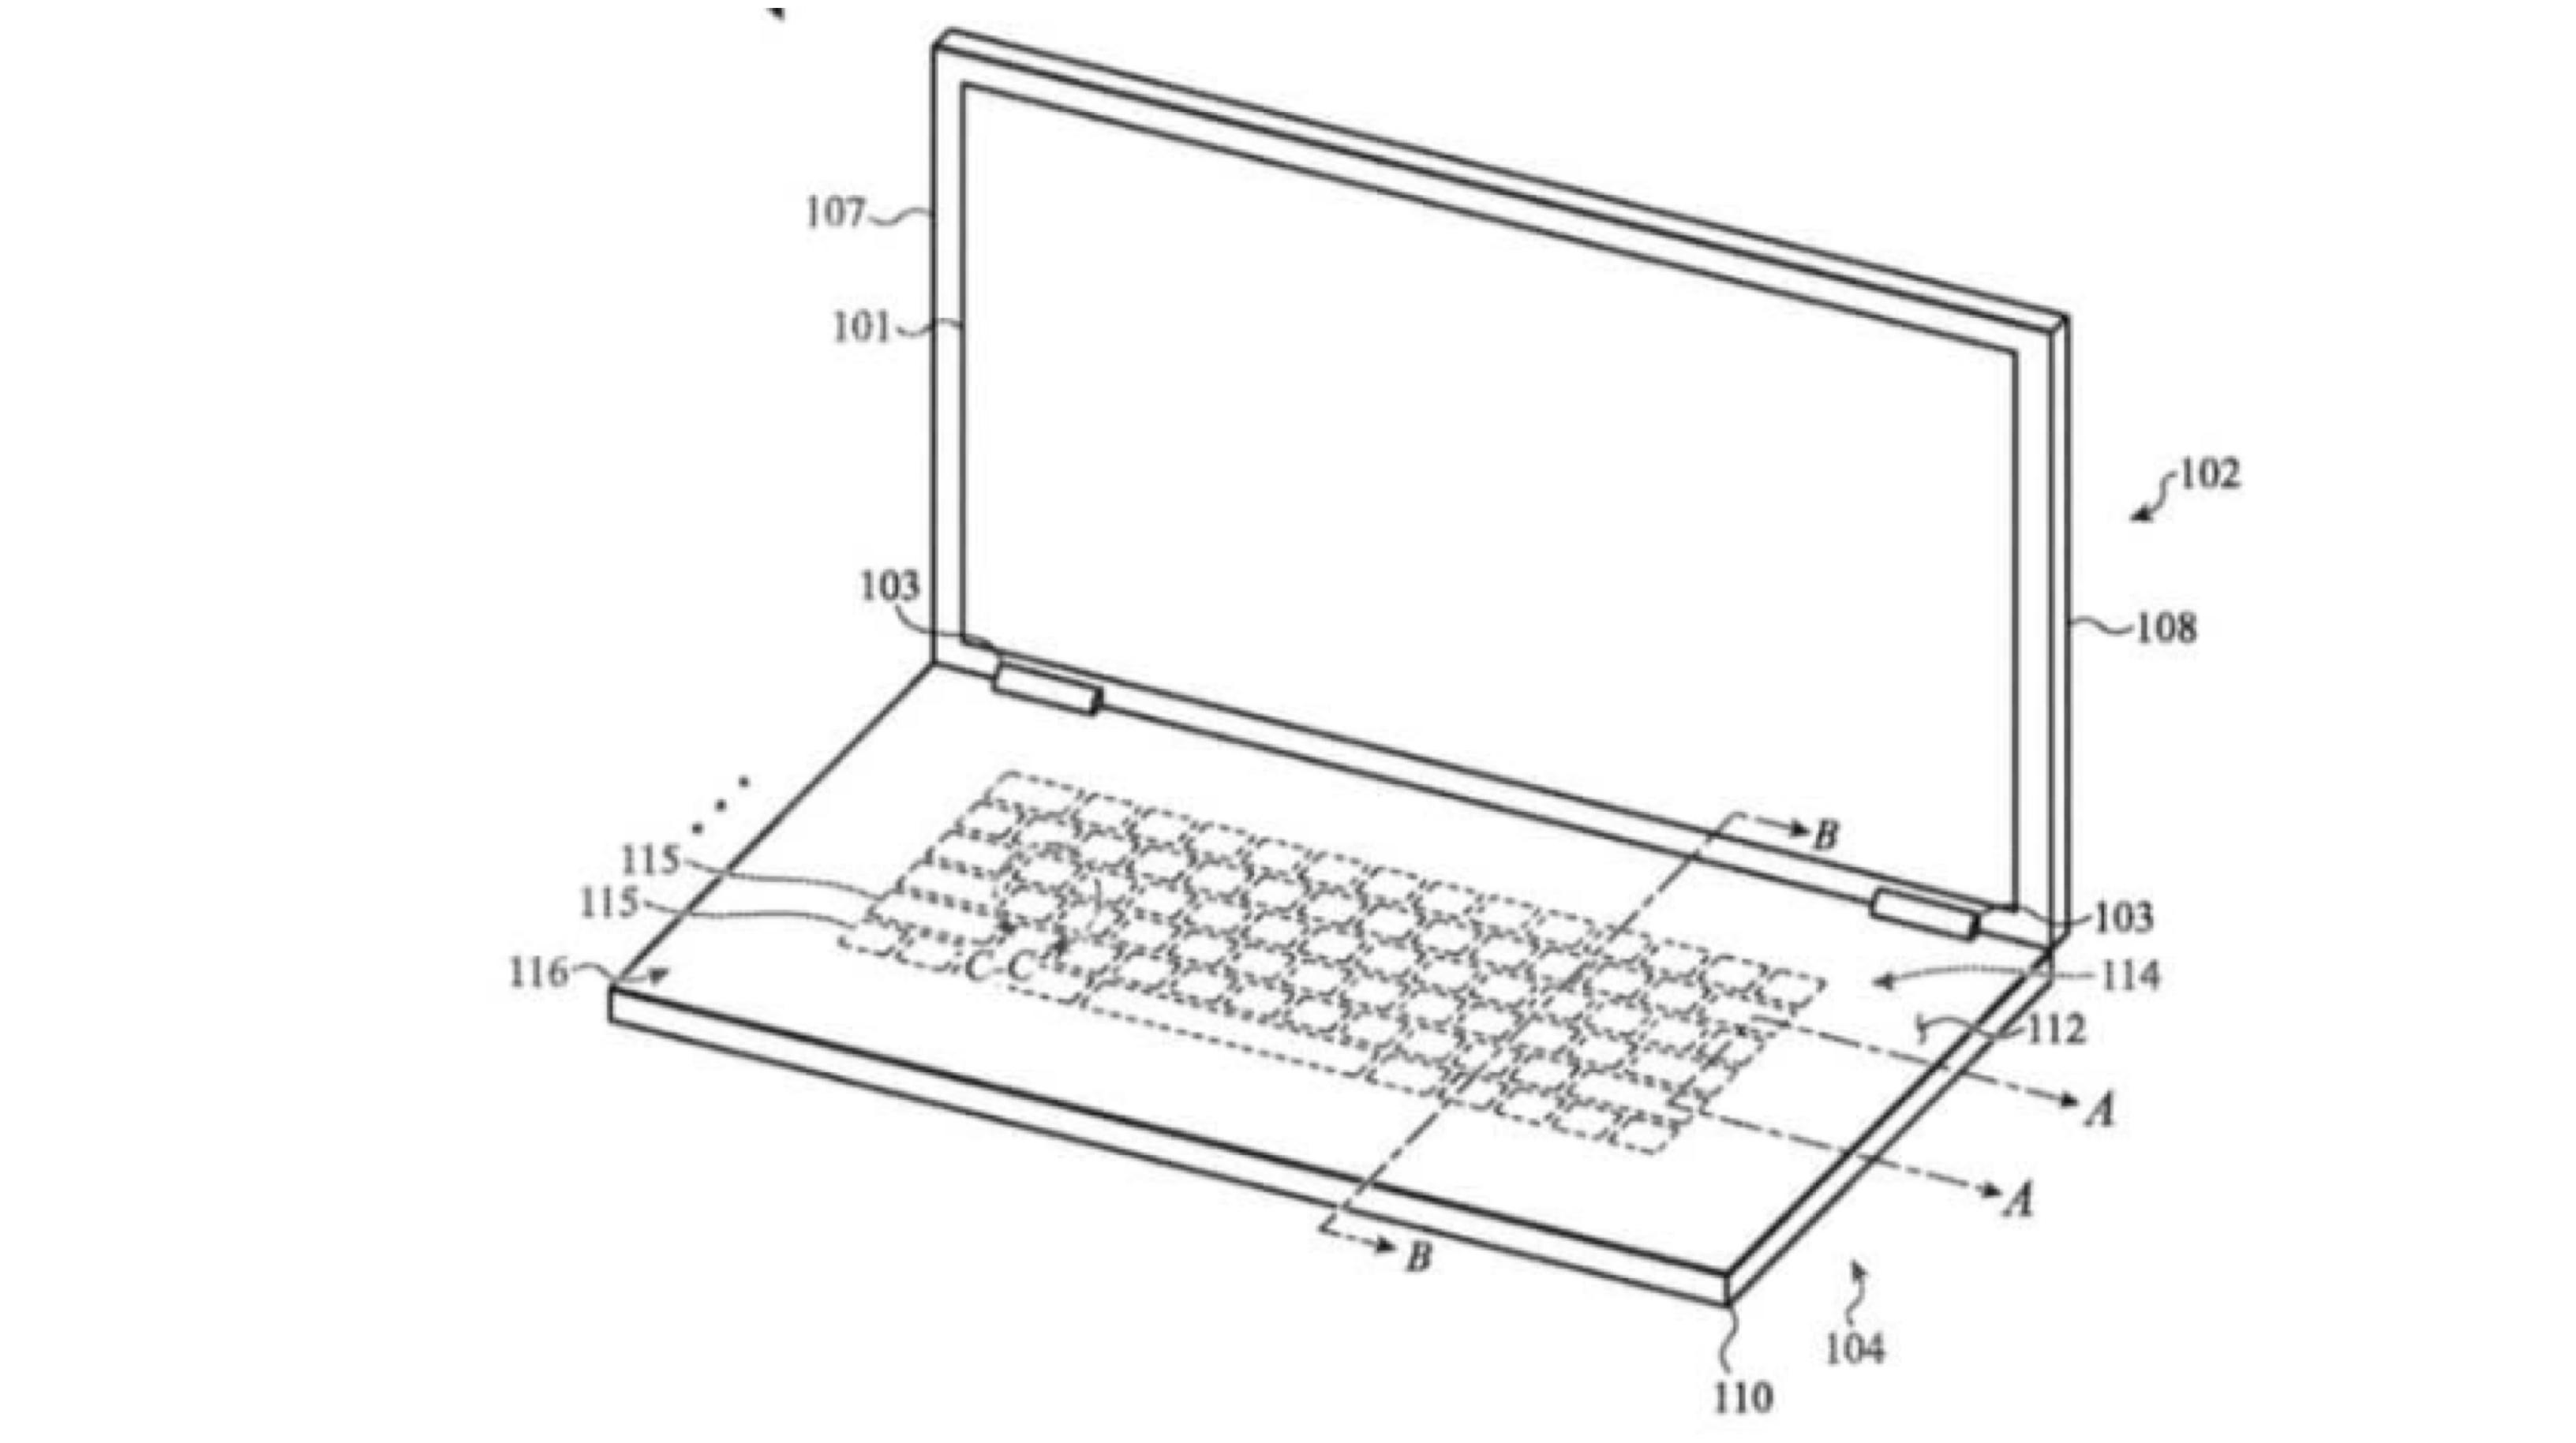 Apple MacBook With Dual Display